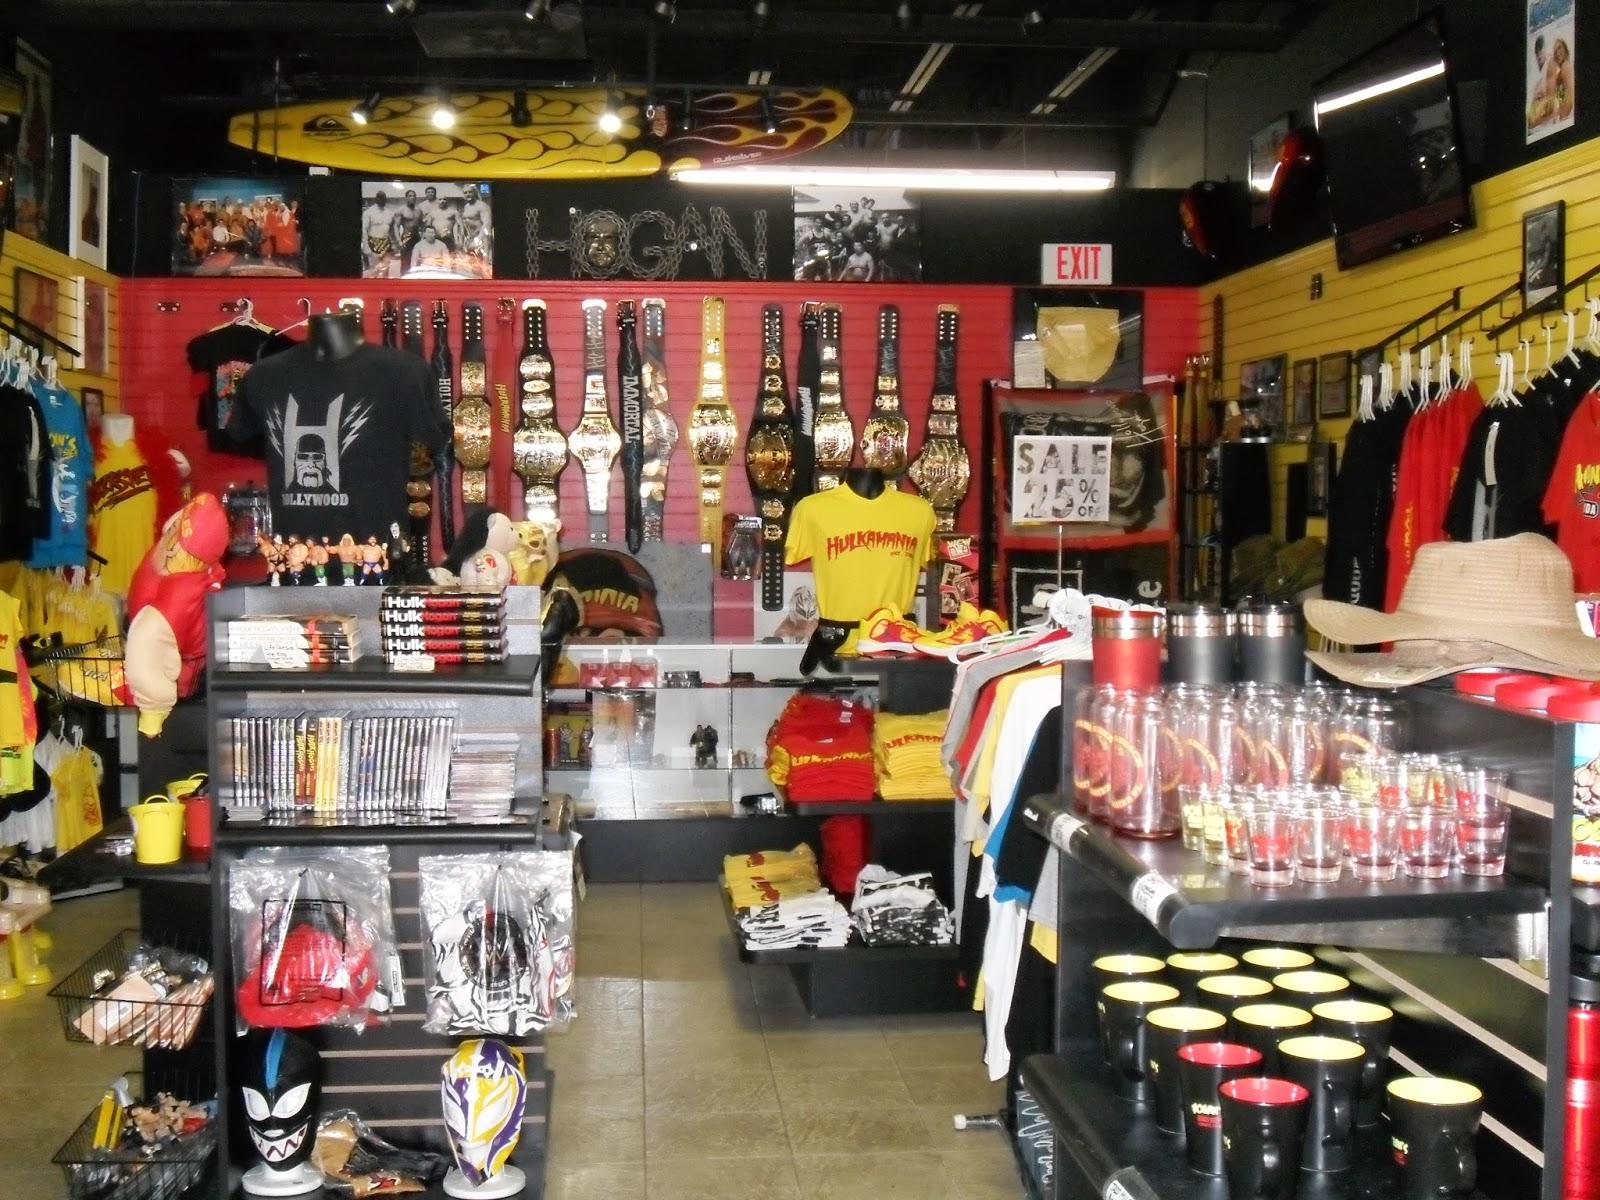 Dukes of Hazzard Collector Hogans Beach Shop in Clearwater FL